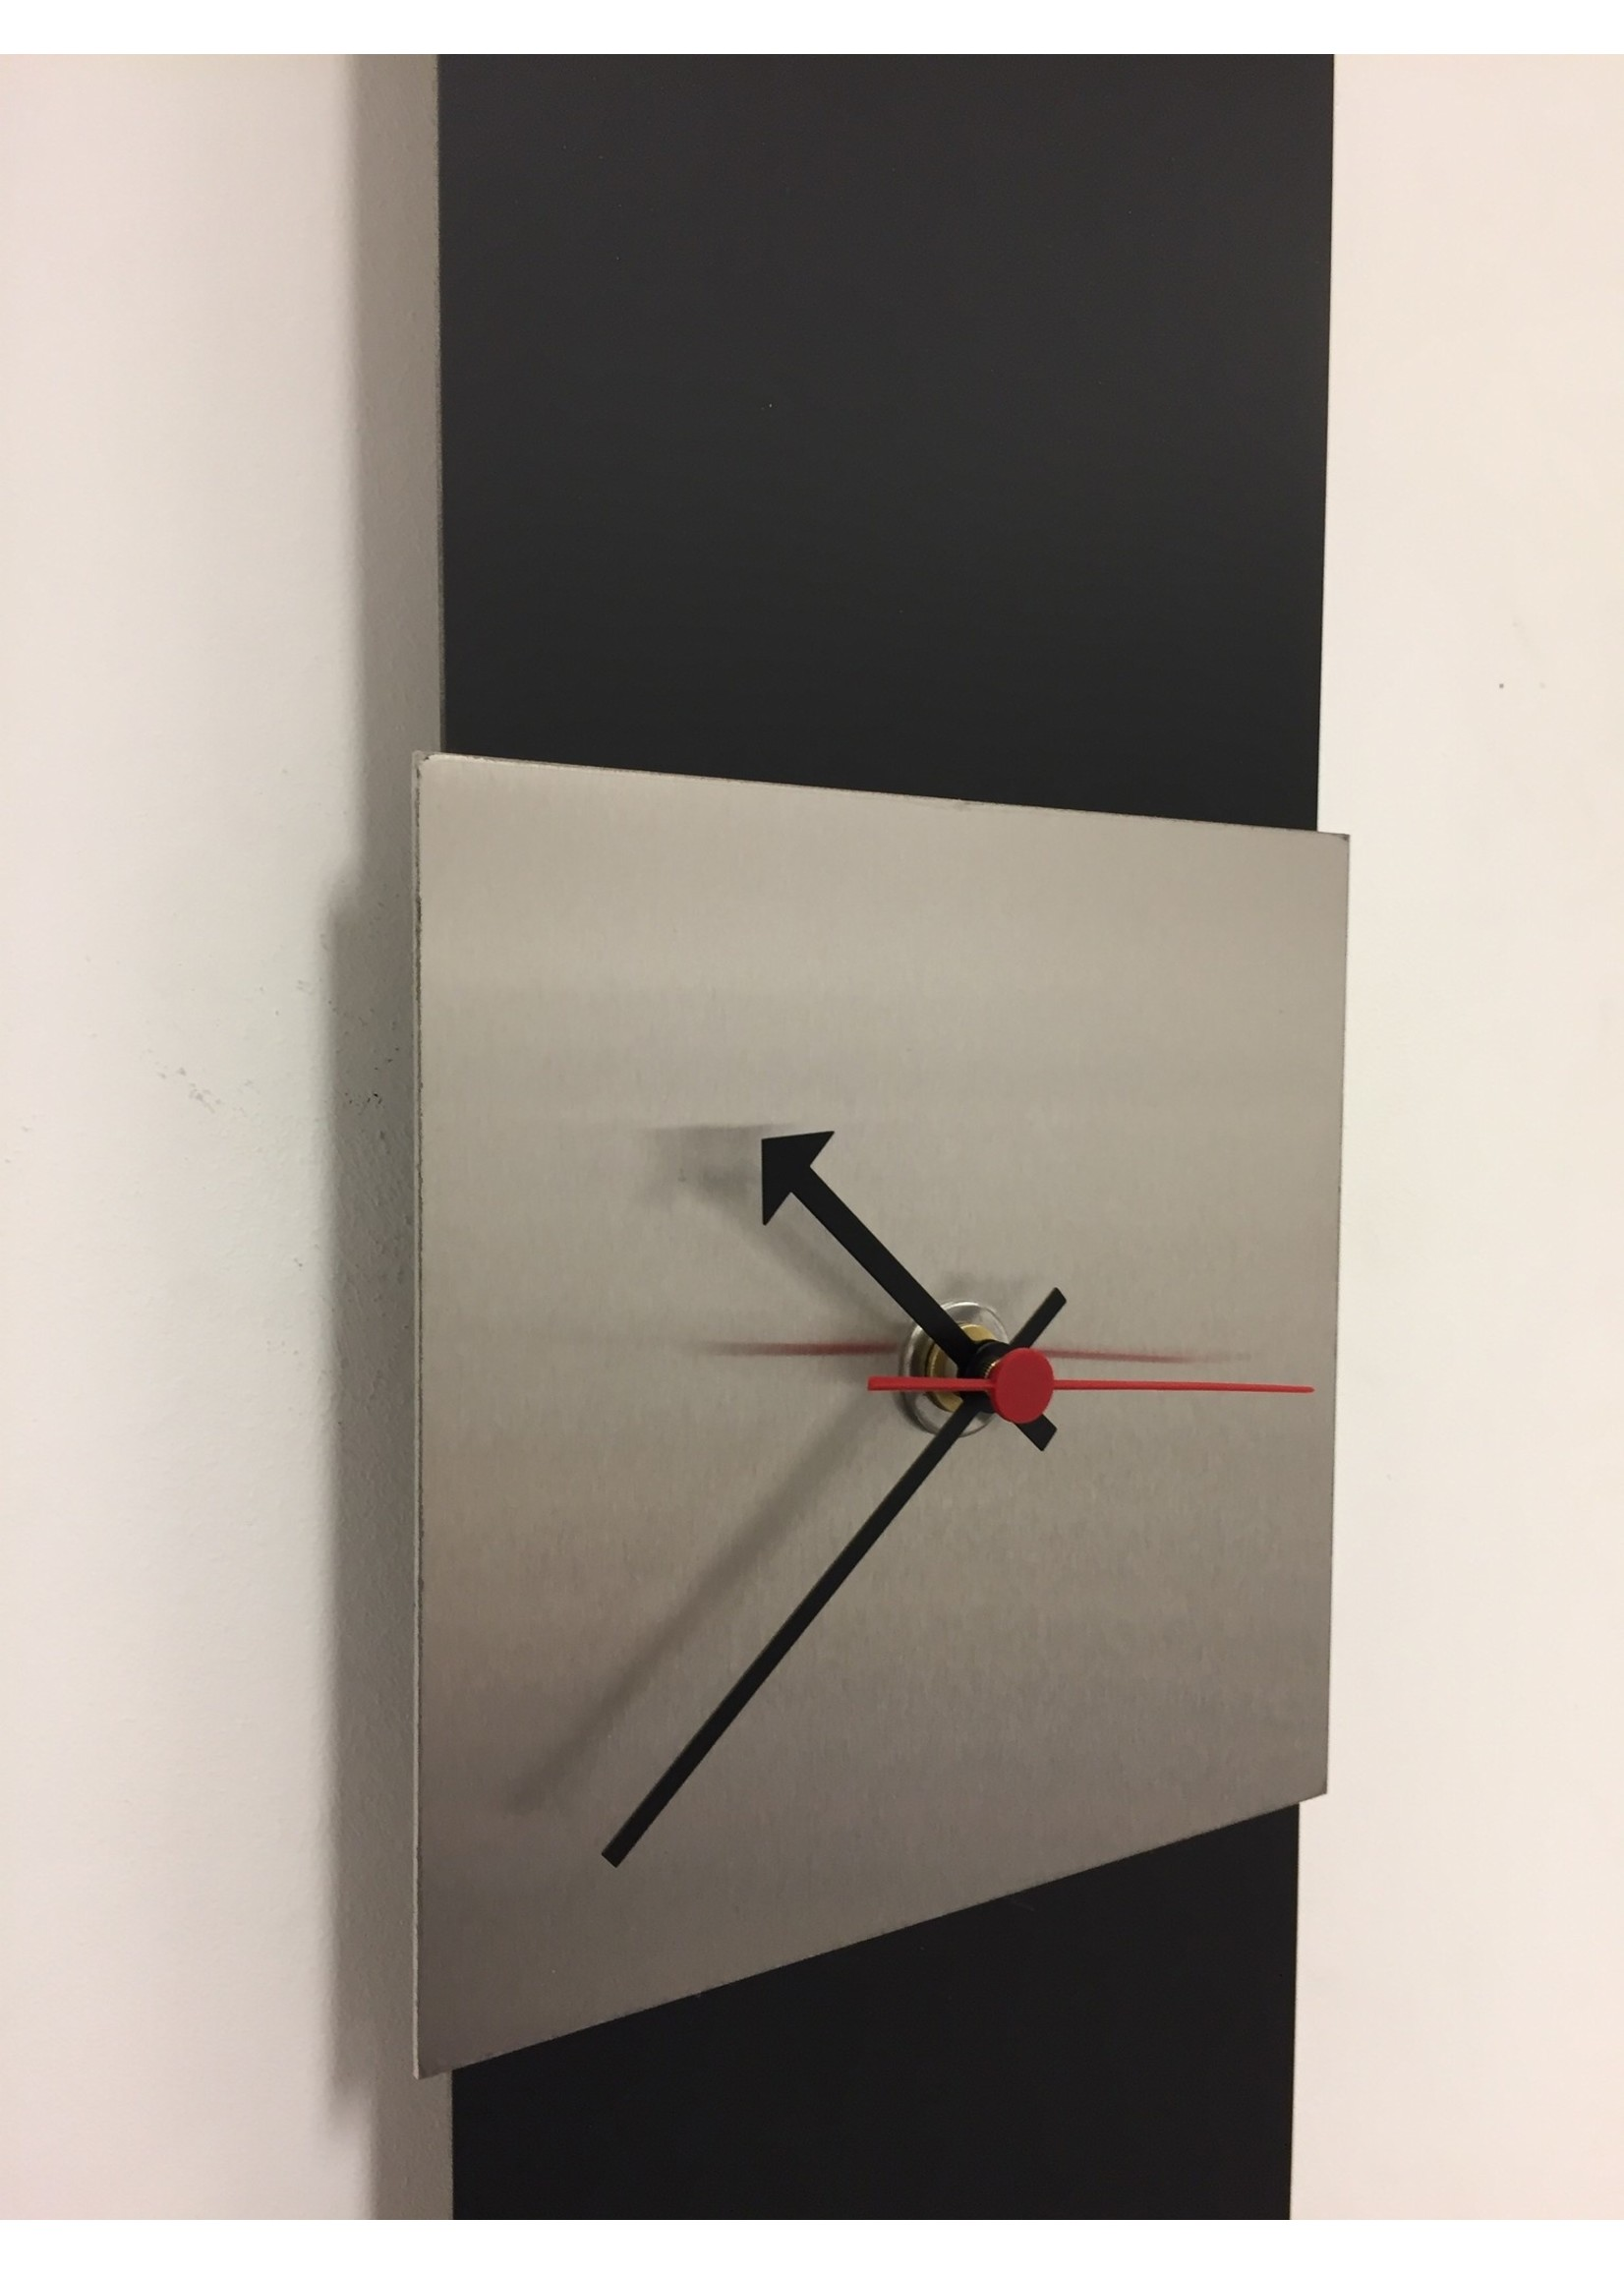 Klokkendiscounter Wandklok Black-Line Silver Square RED Pointer Modern Design RVS